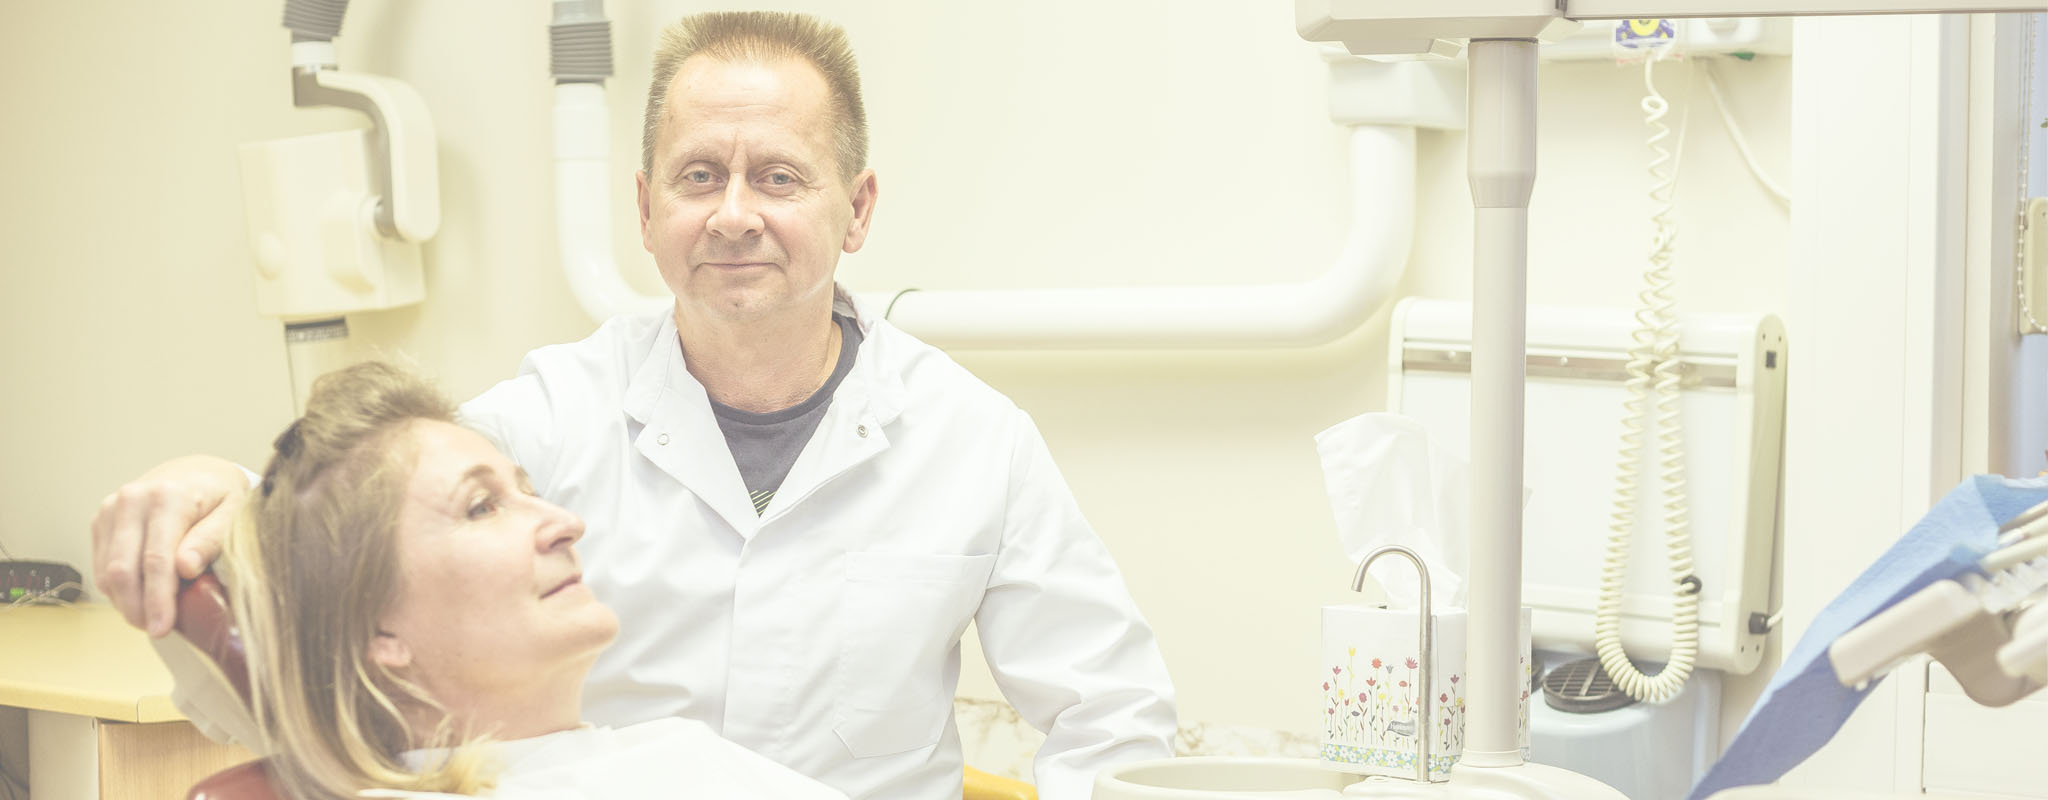 Dr. Sergei Bortnikov